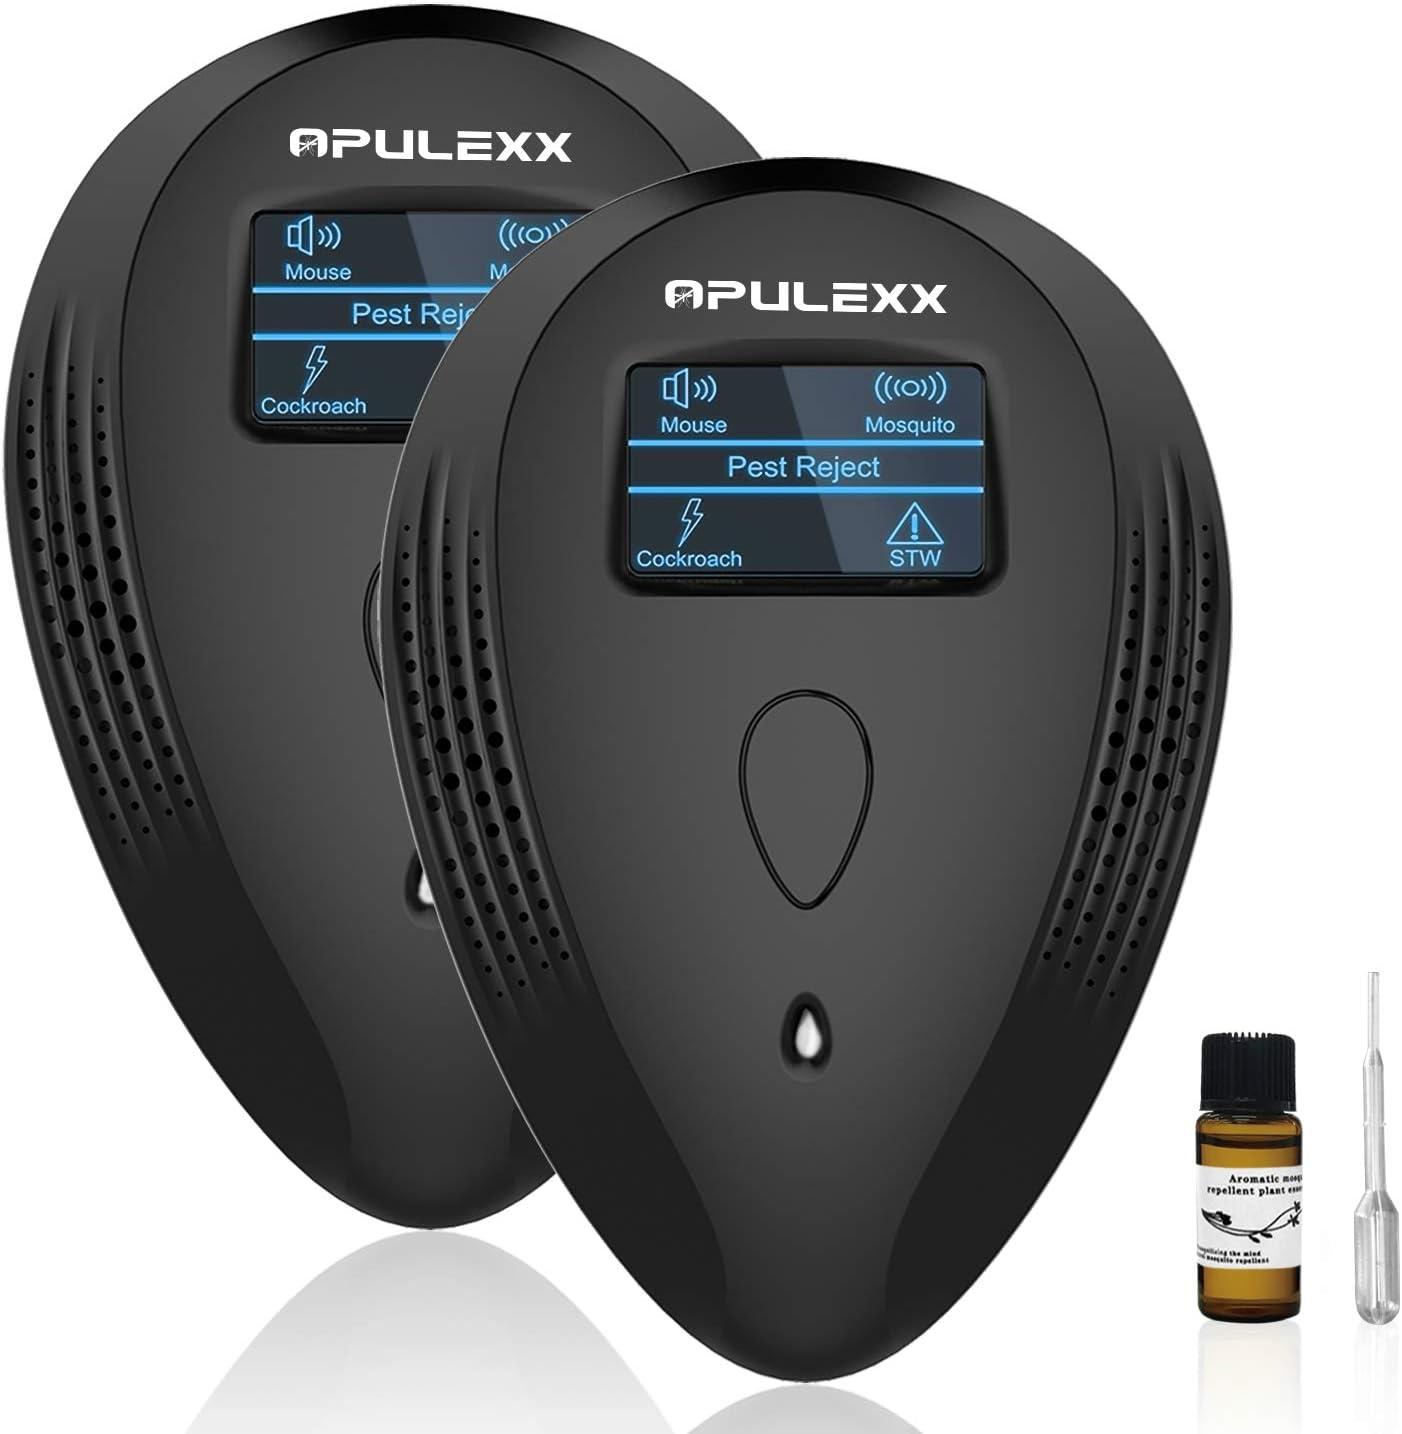 Free Amazon Promo Code 2020 for Ultrasonic Pest Repeller